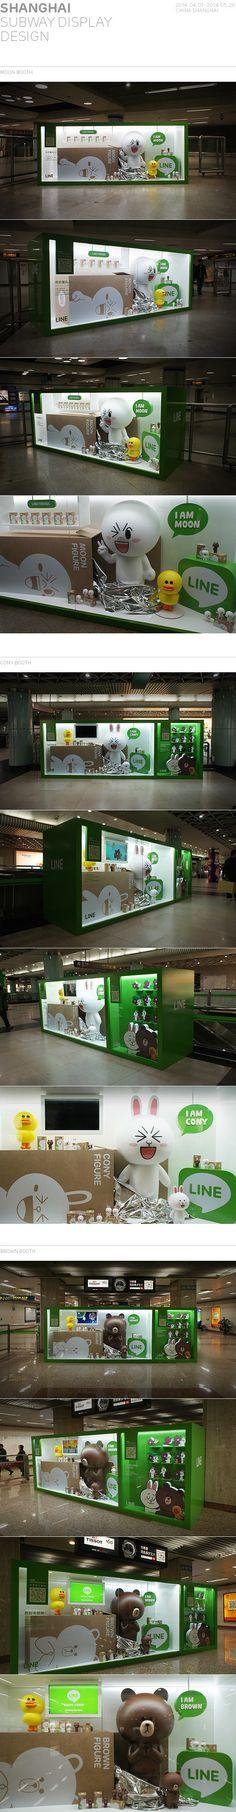 LINE Advertising in Shanghai by LINE Creative, via Behance